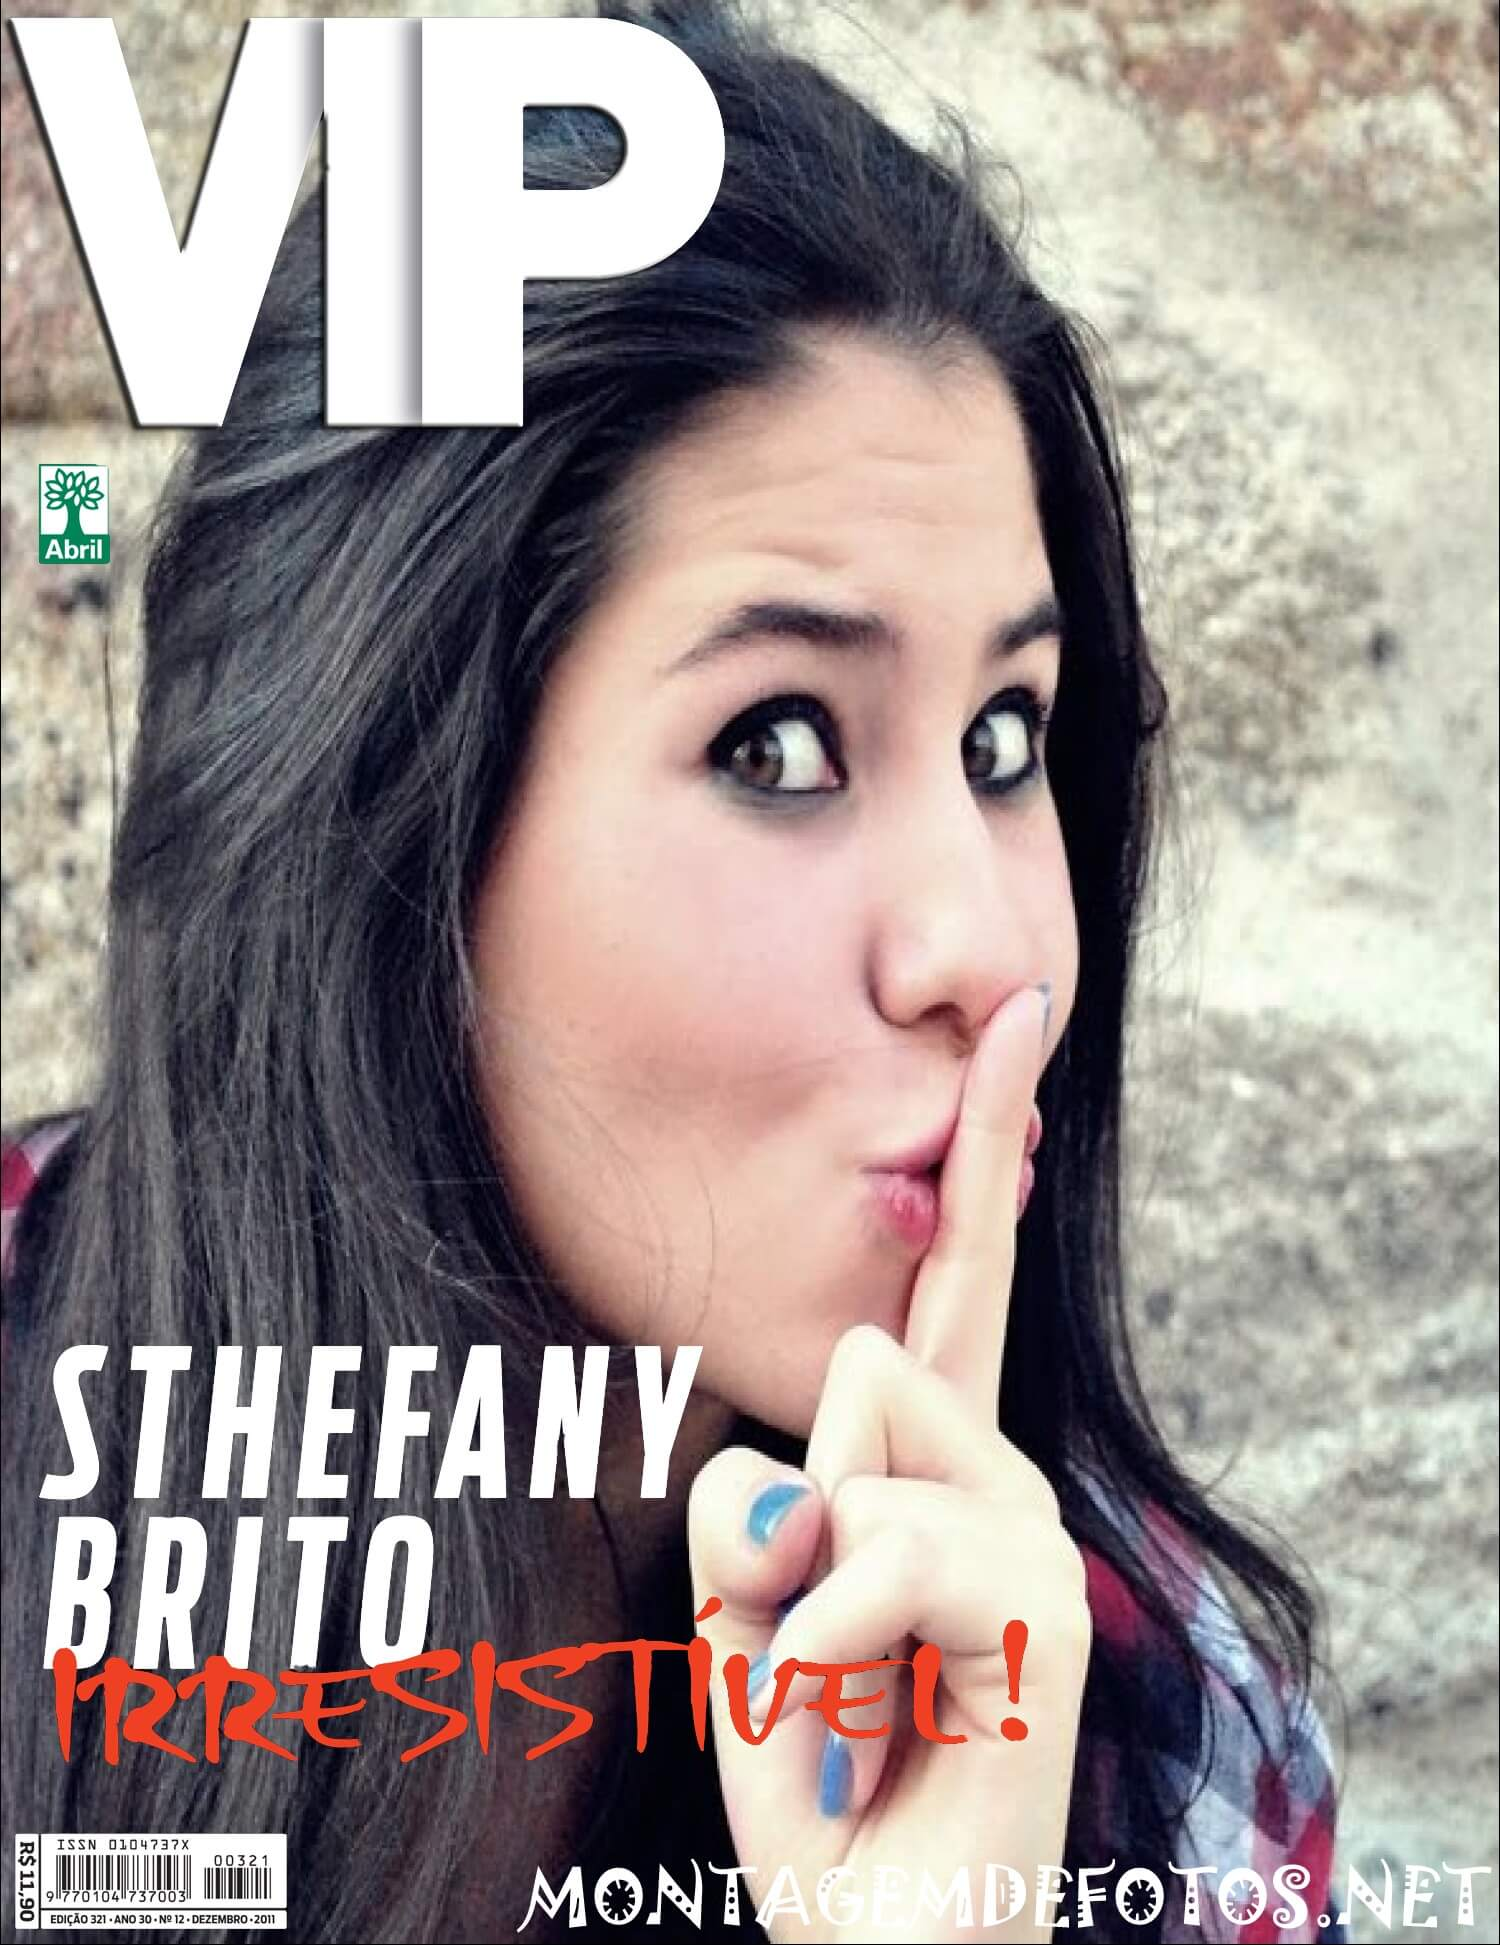 revista-vip-foto-montagem